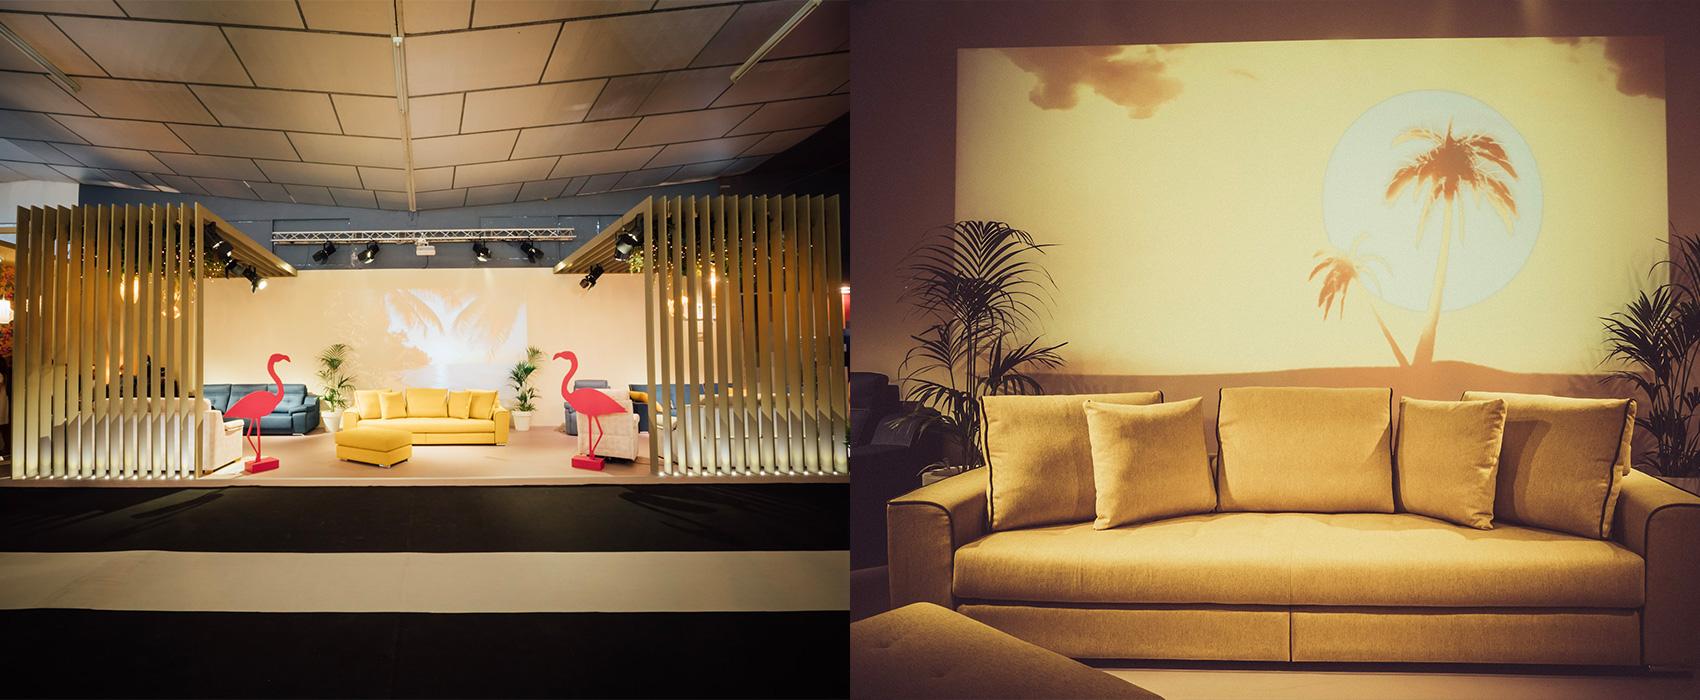 Cloë Decoración — Eventos - Proyecto